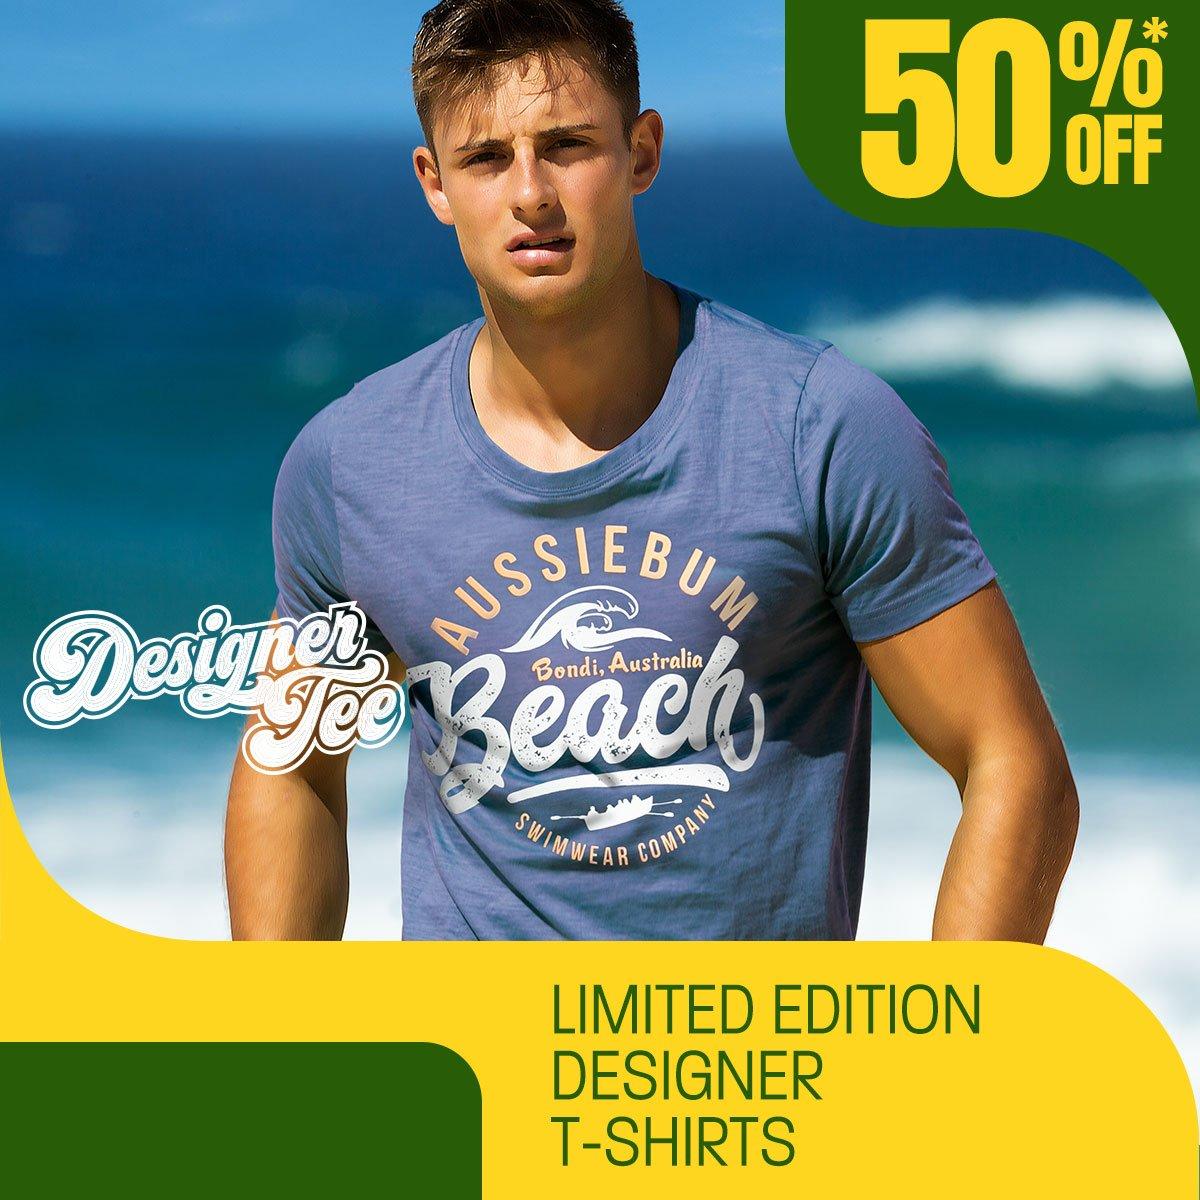 Designer Tee Bondi Denim Homepage Image